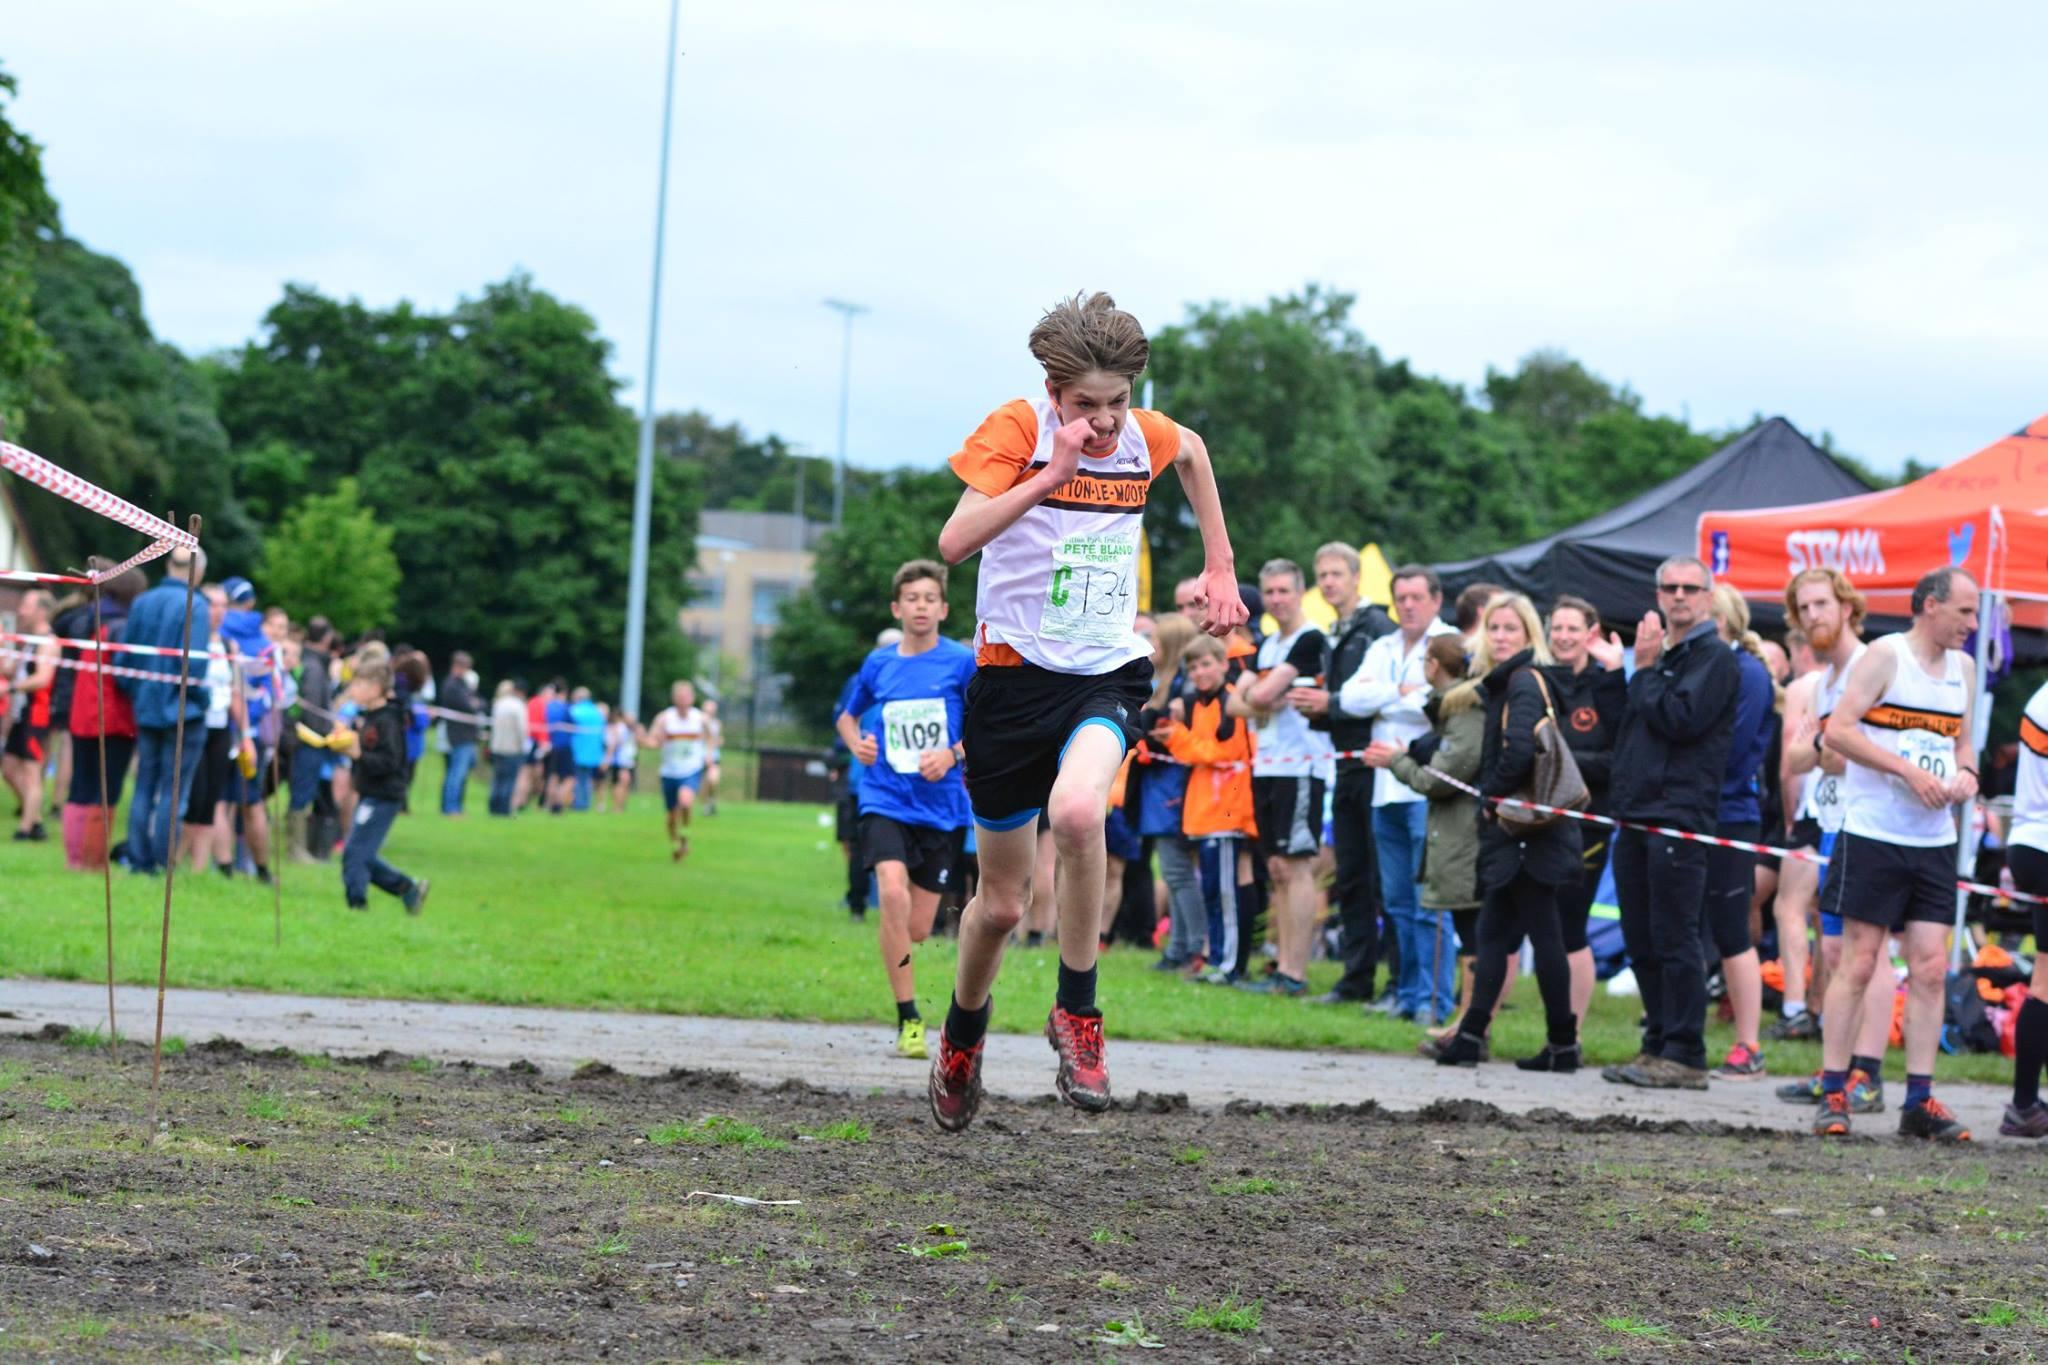 Sprint finish from junior runner, Adam Stevenson. Photo by David Belshaw